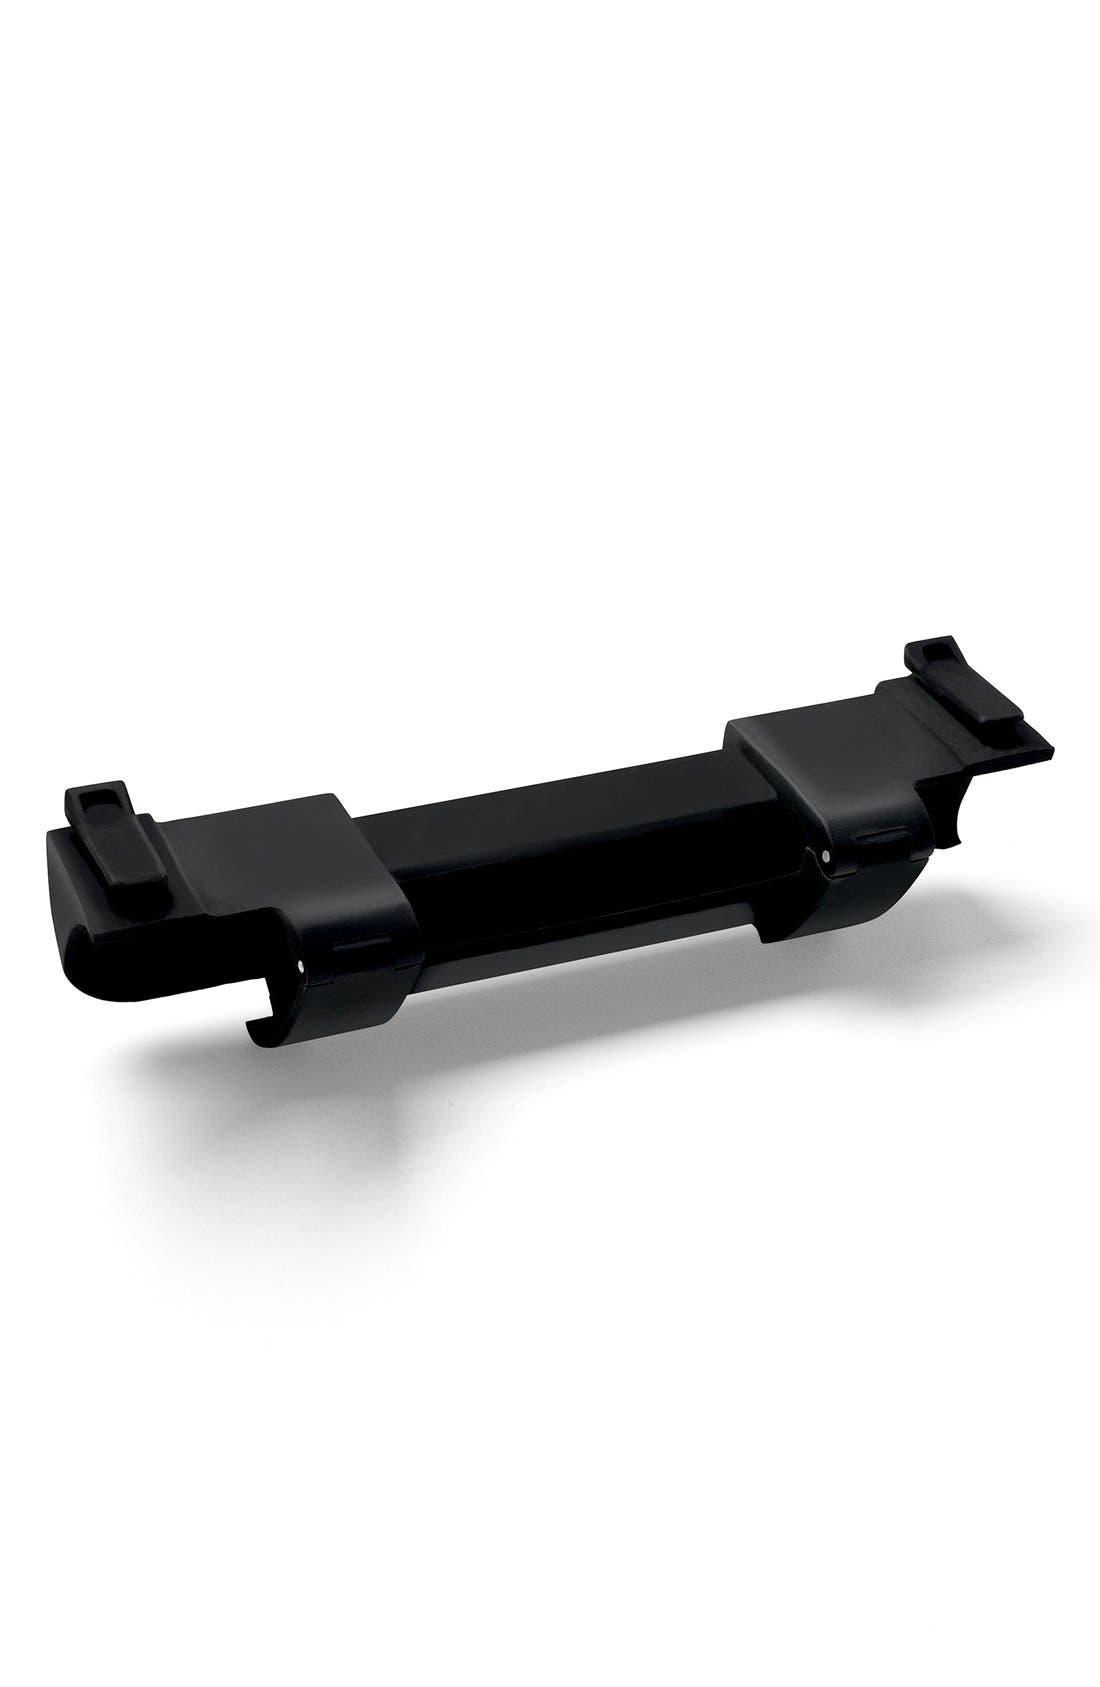 Bugaboo Donkey/Buffalo Adapter for 2015 Comfort Wheeled Board